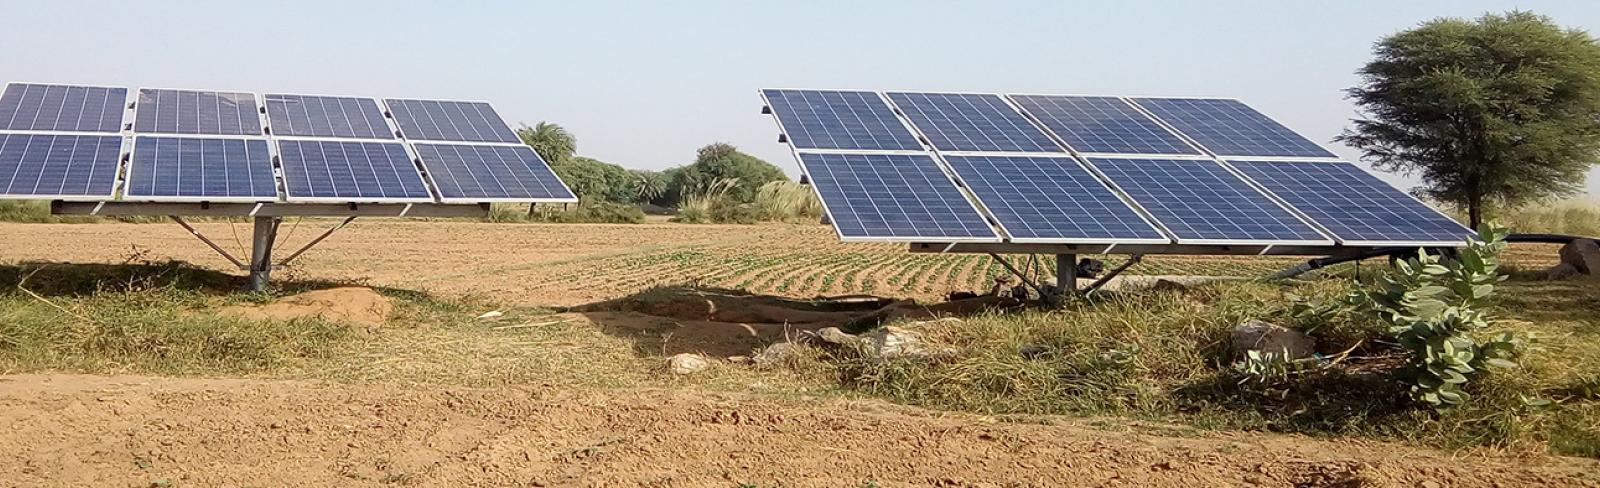 Scaling Up Mini Grids to Reach Universal Access | Abuja, Nigeria